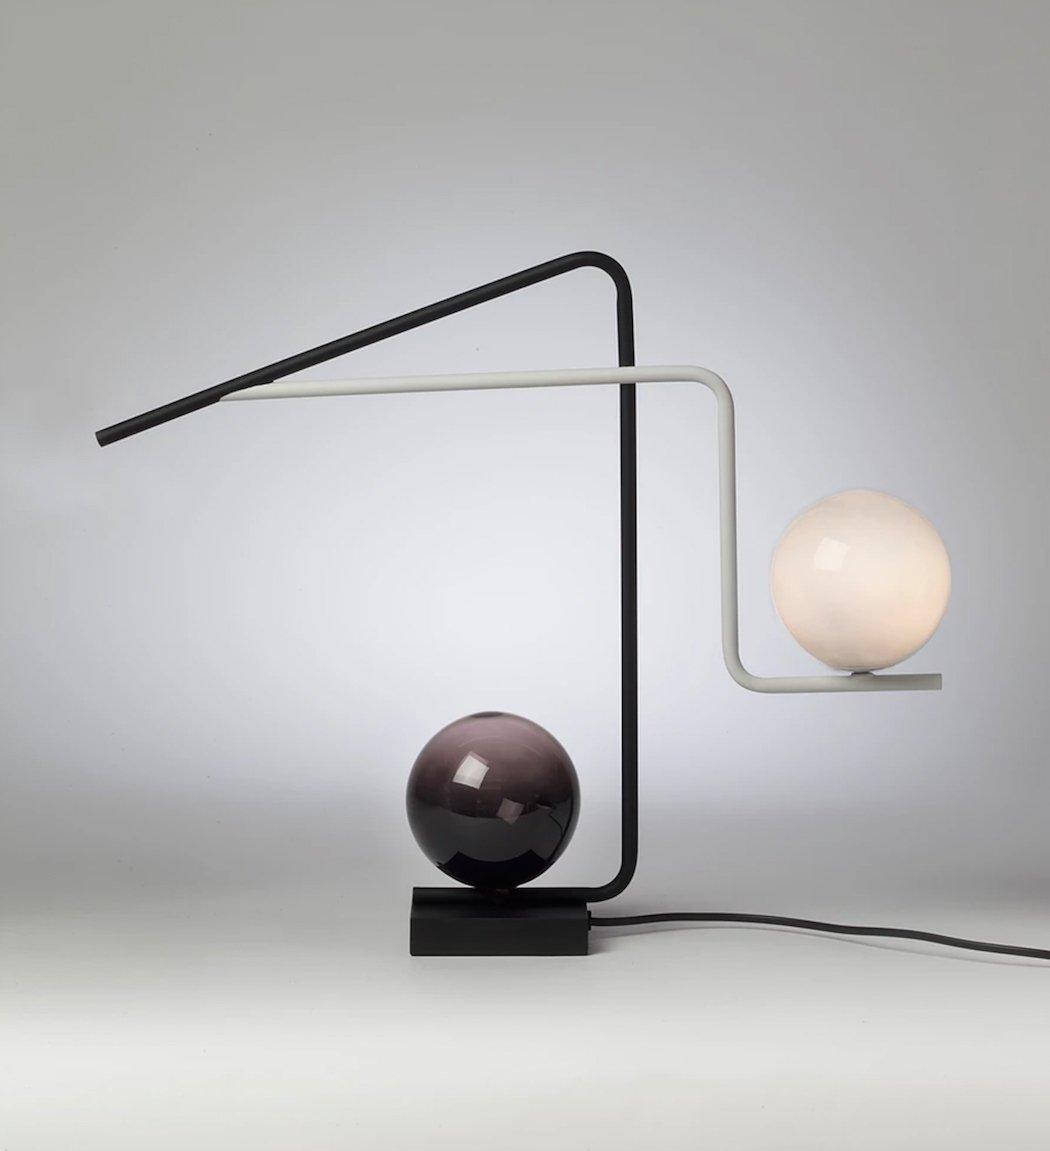 iGNANT_Design_Sculptures_Lumineuses_Nathalie_Nahon-1